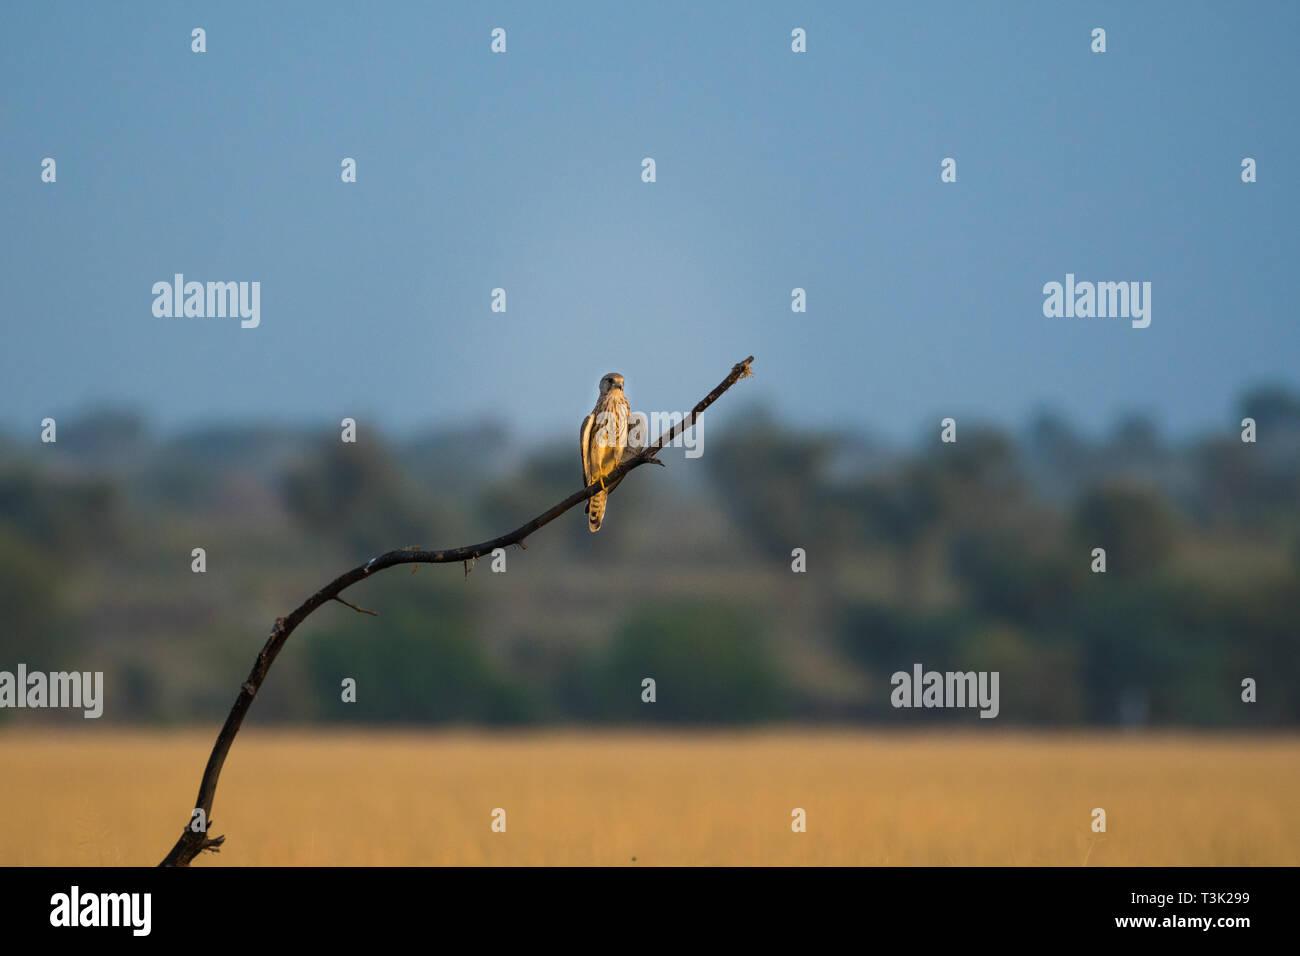 A habitat image of Common kestrel or Falco tinnunculus sitting on a beautiful perch at tal chappar blackbuck sanctuary, India - Stock Image